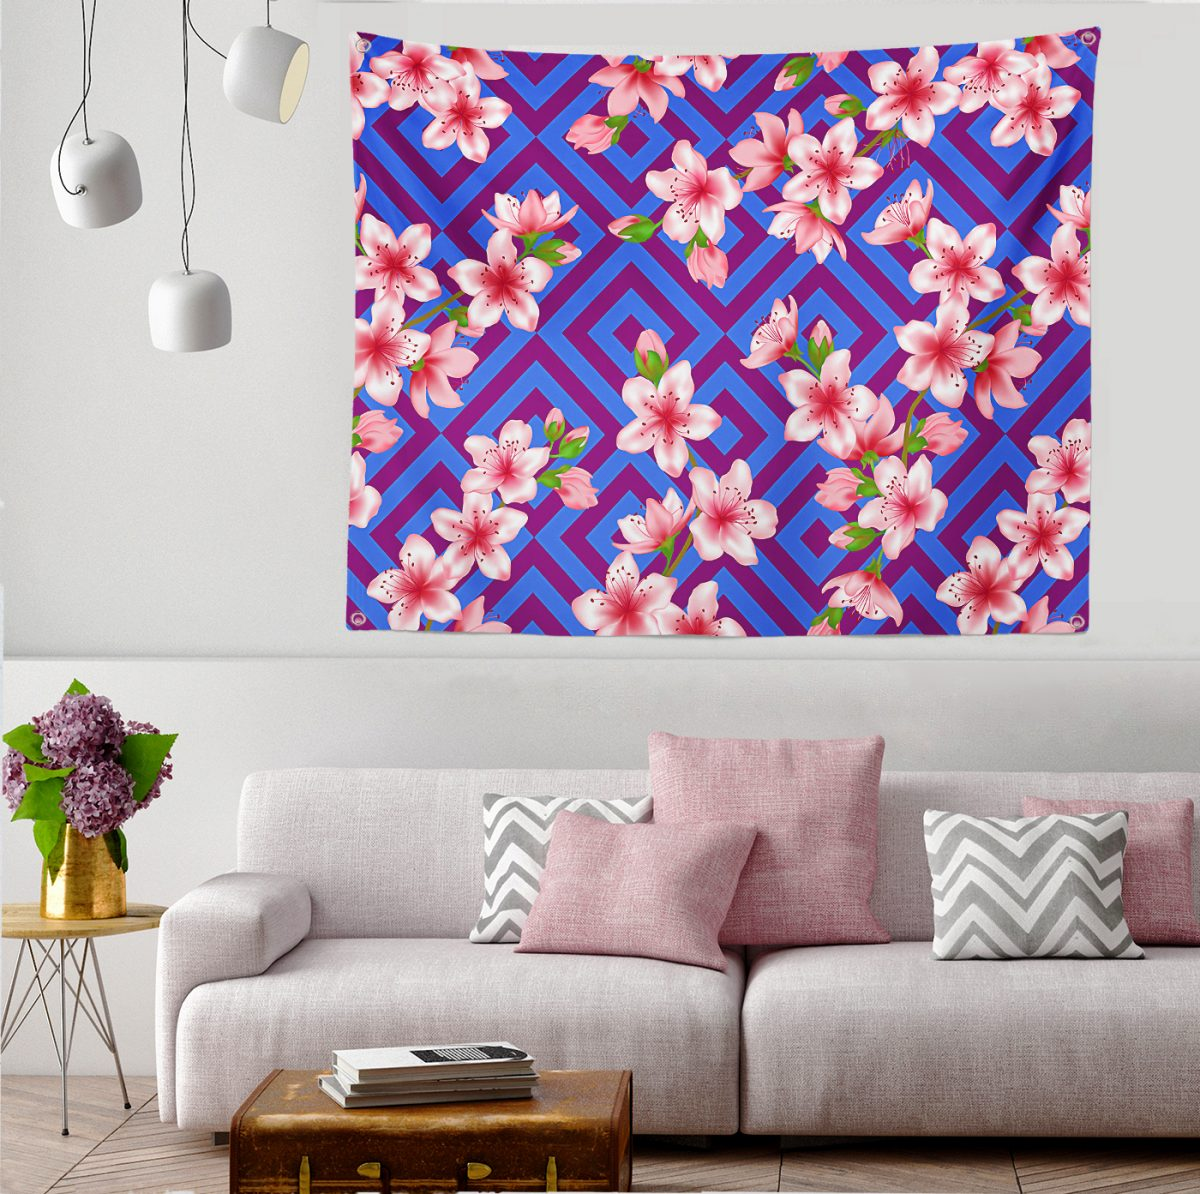 Realhomes Moda Multi Color Özel Tasarım Dijital Baskılı Tapestry Duvar Örtüsü Realhomes